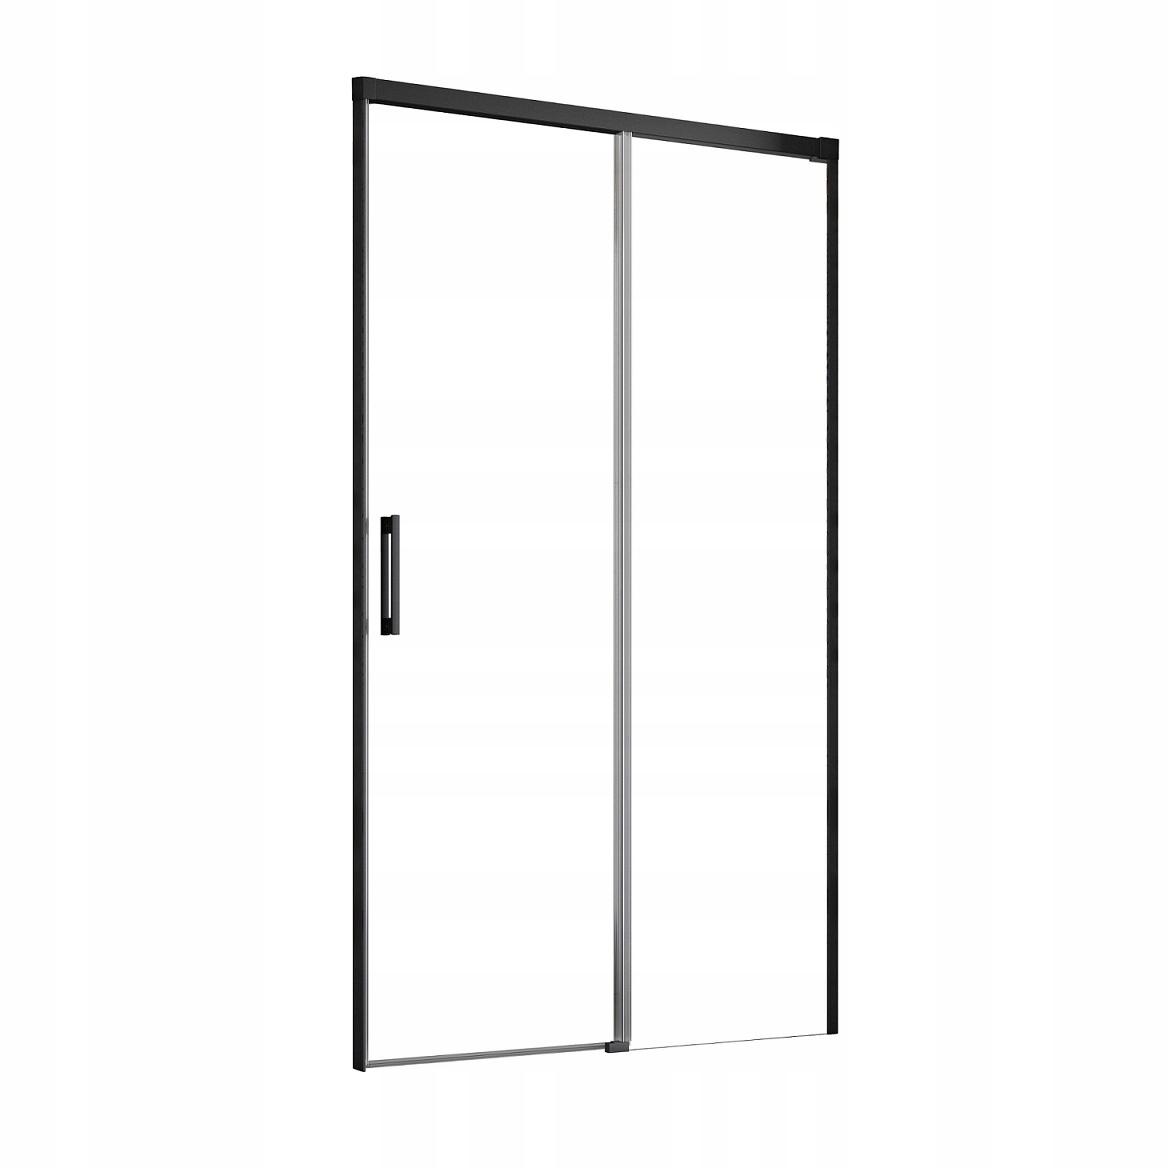 Idea Black DWJ 130x200,5 čierne dvere RADAWAY